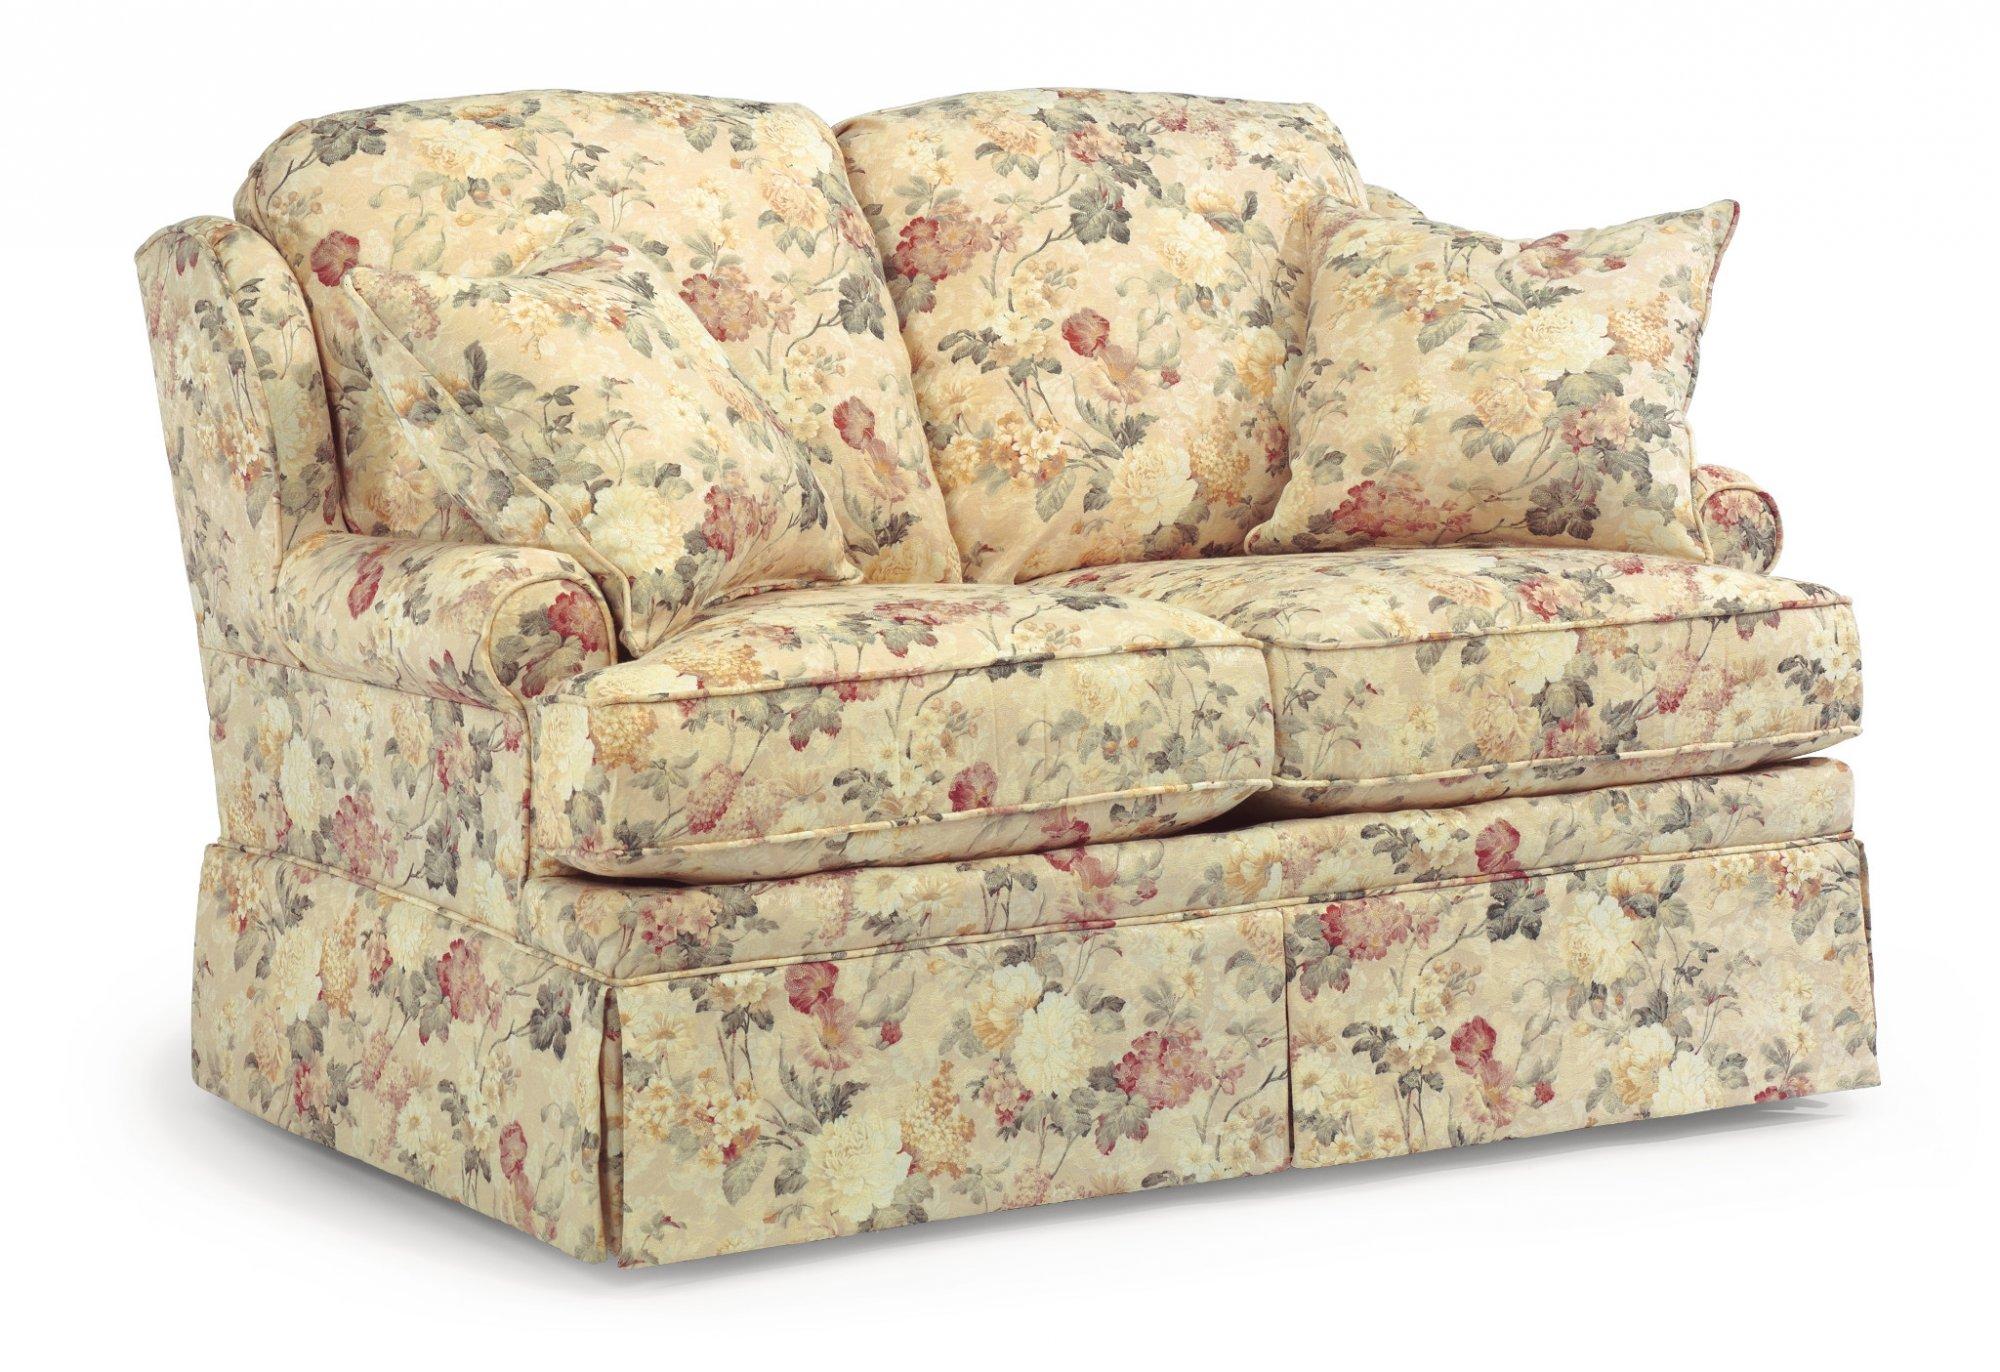 flexsteel sofa sets atalanta vs juventus sofascore danville com share via email download a high resolution image